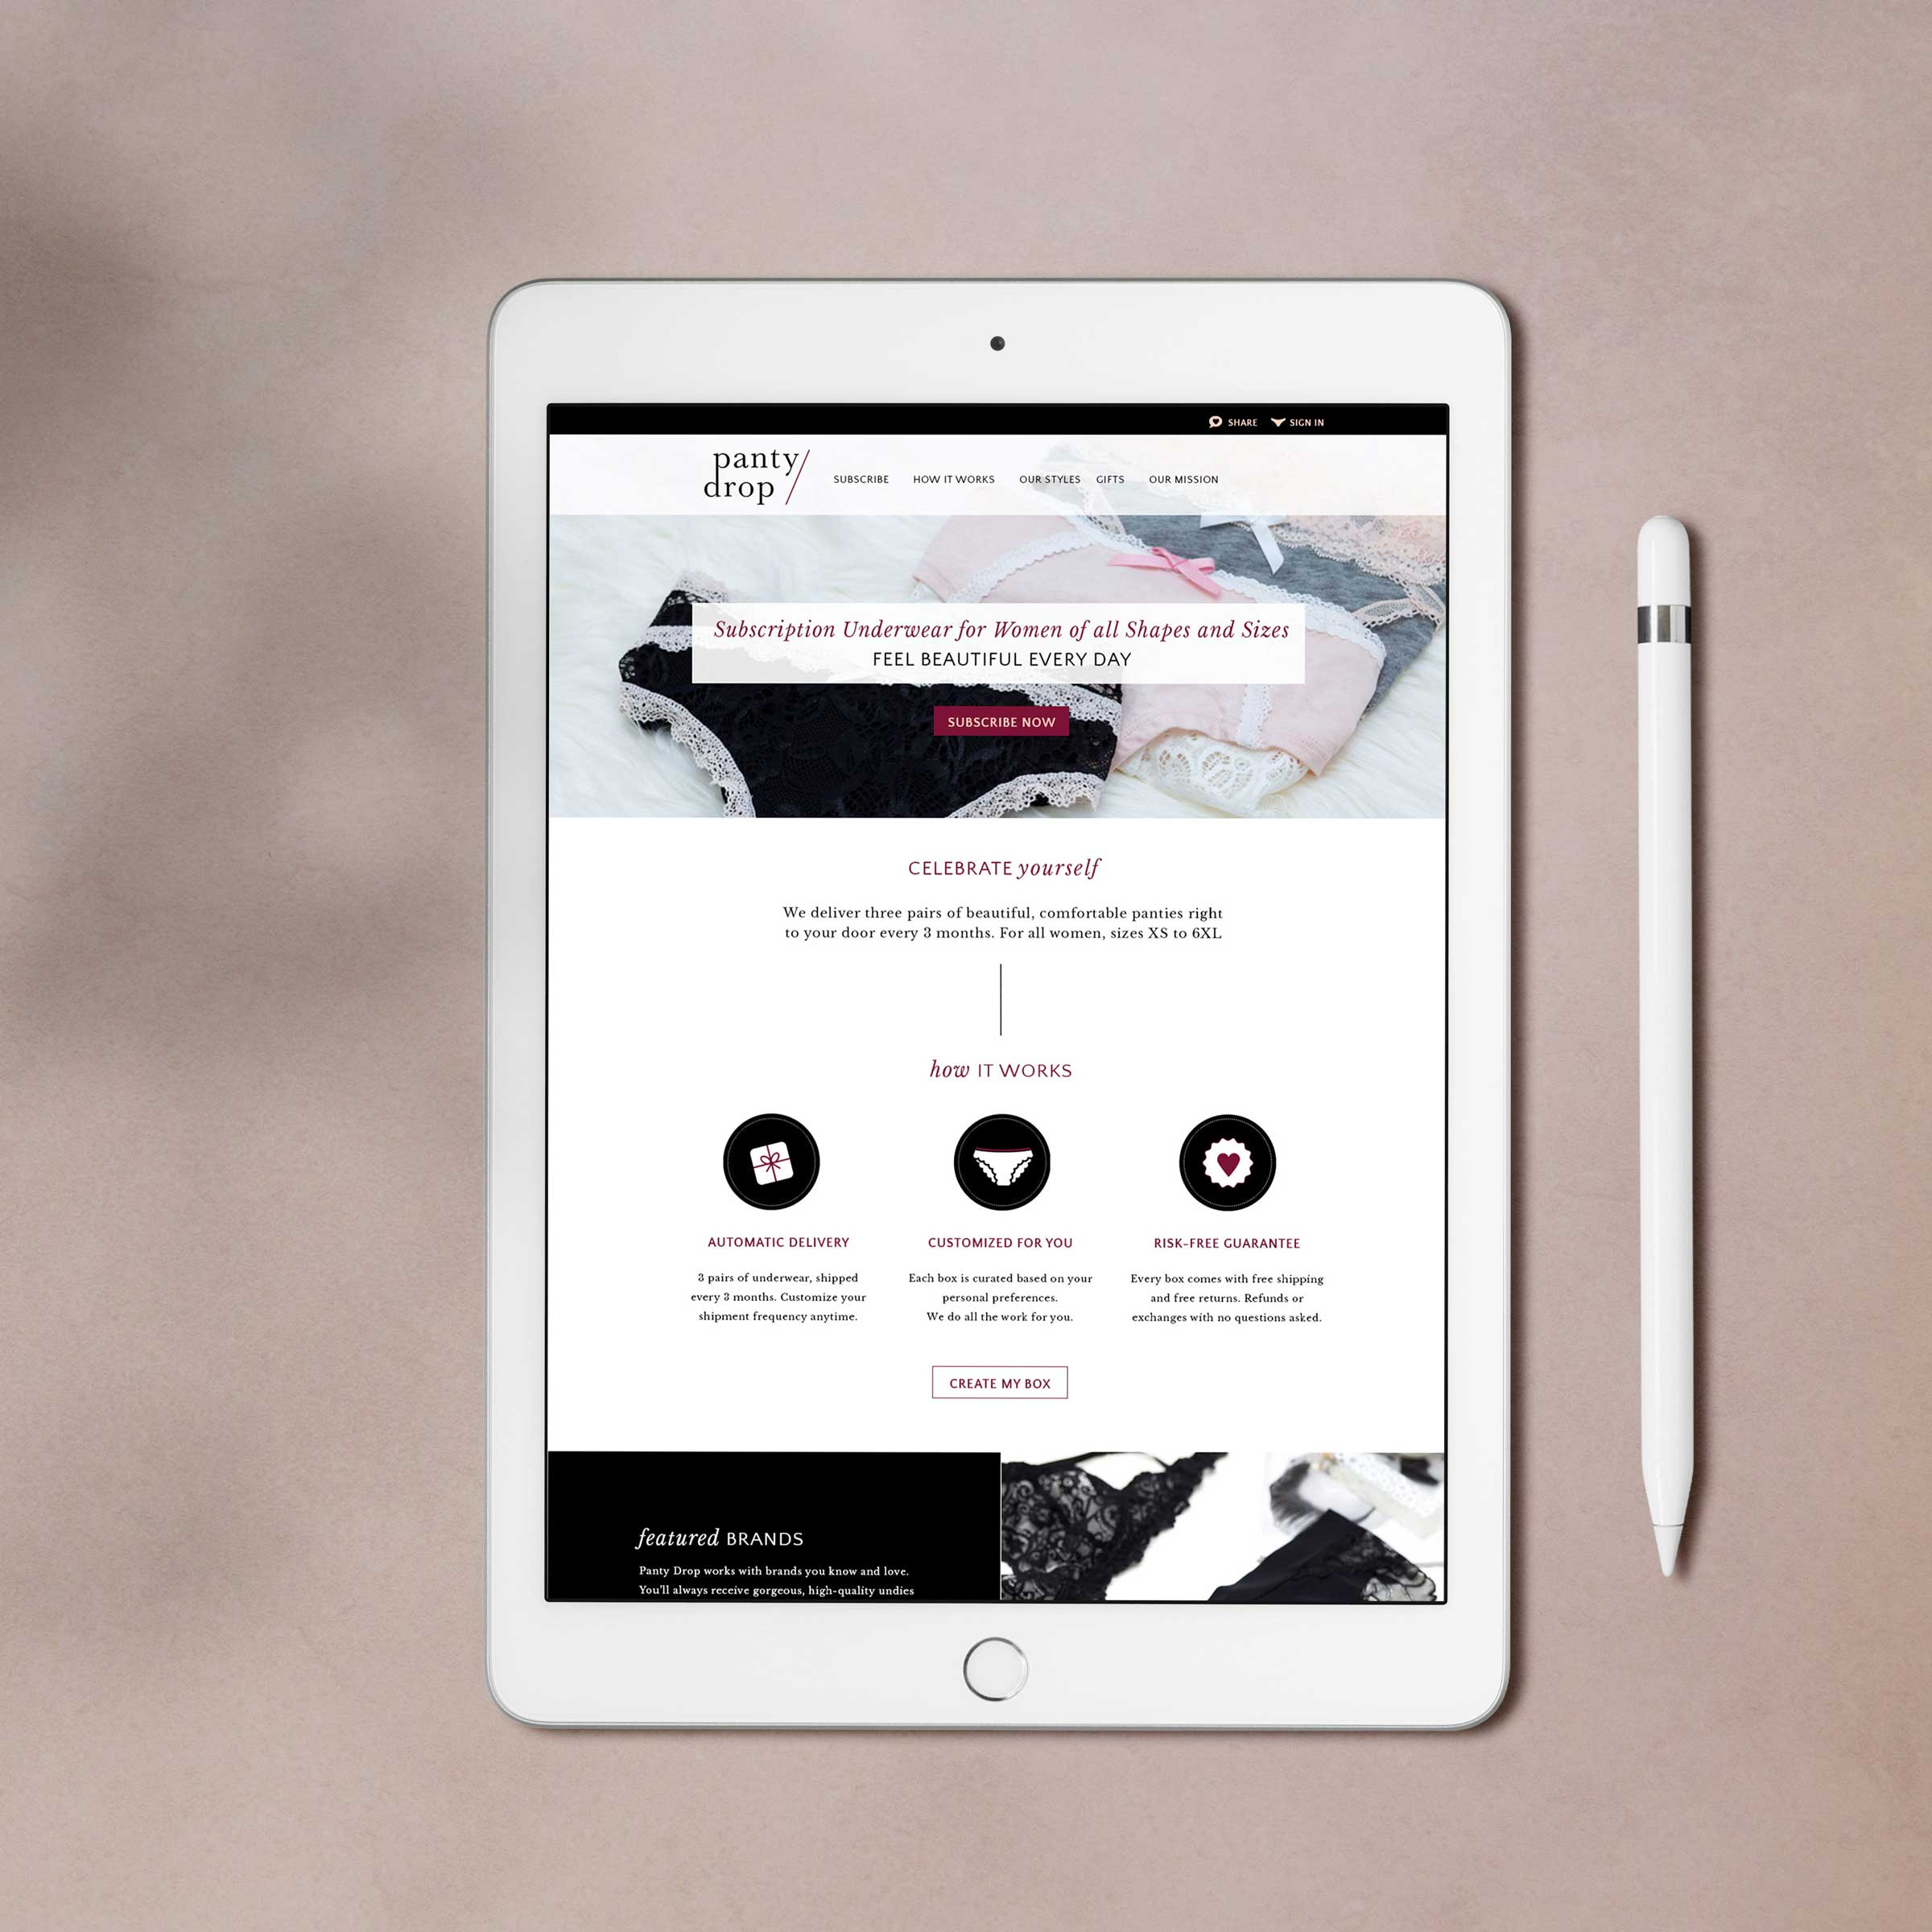 Pantry Drop •  brand & ecommerce web design